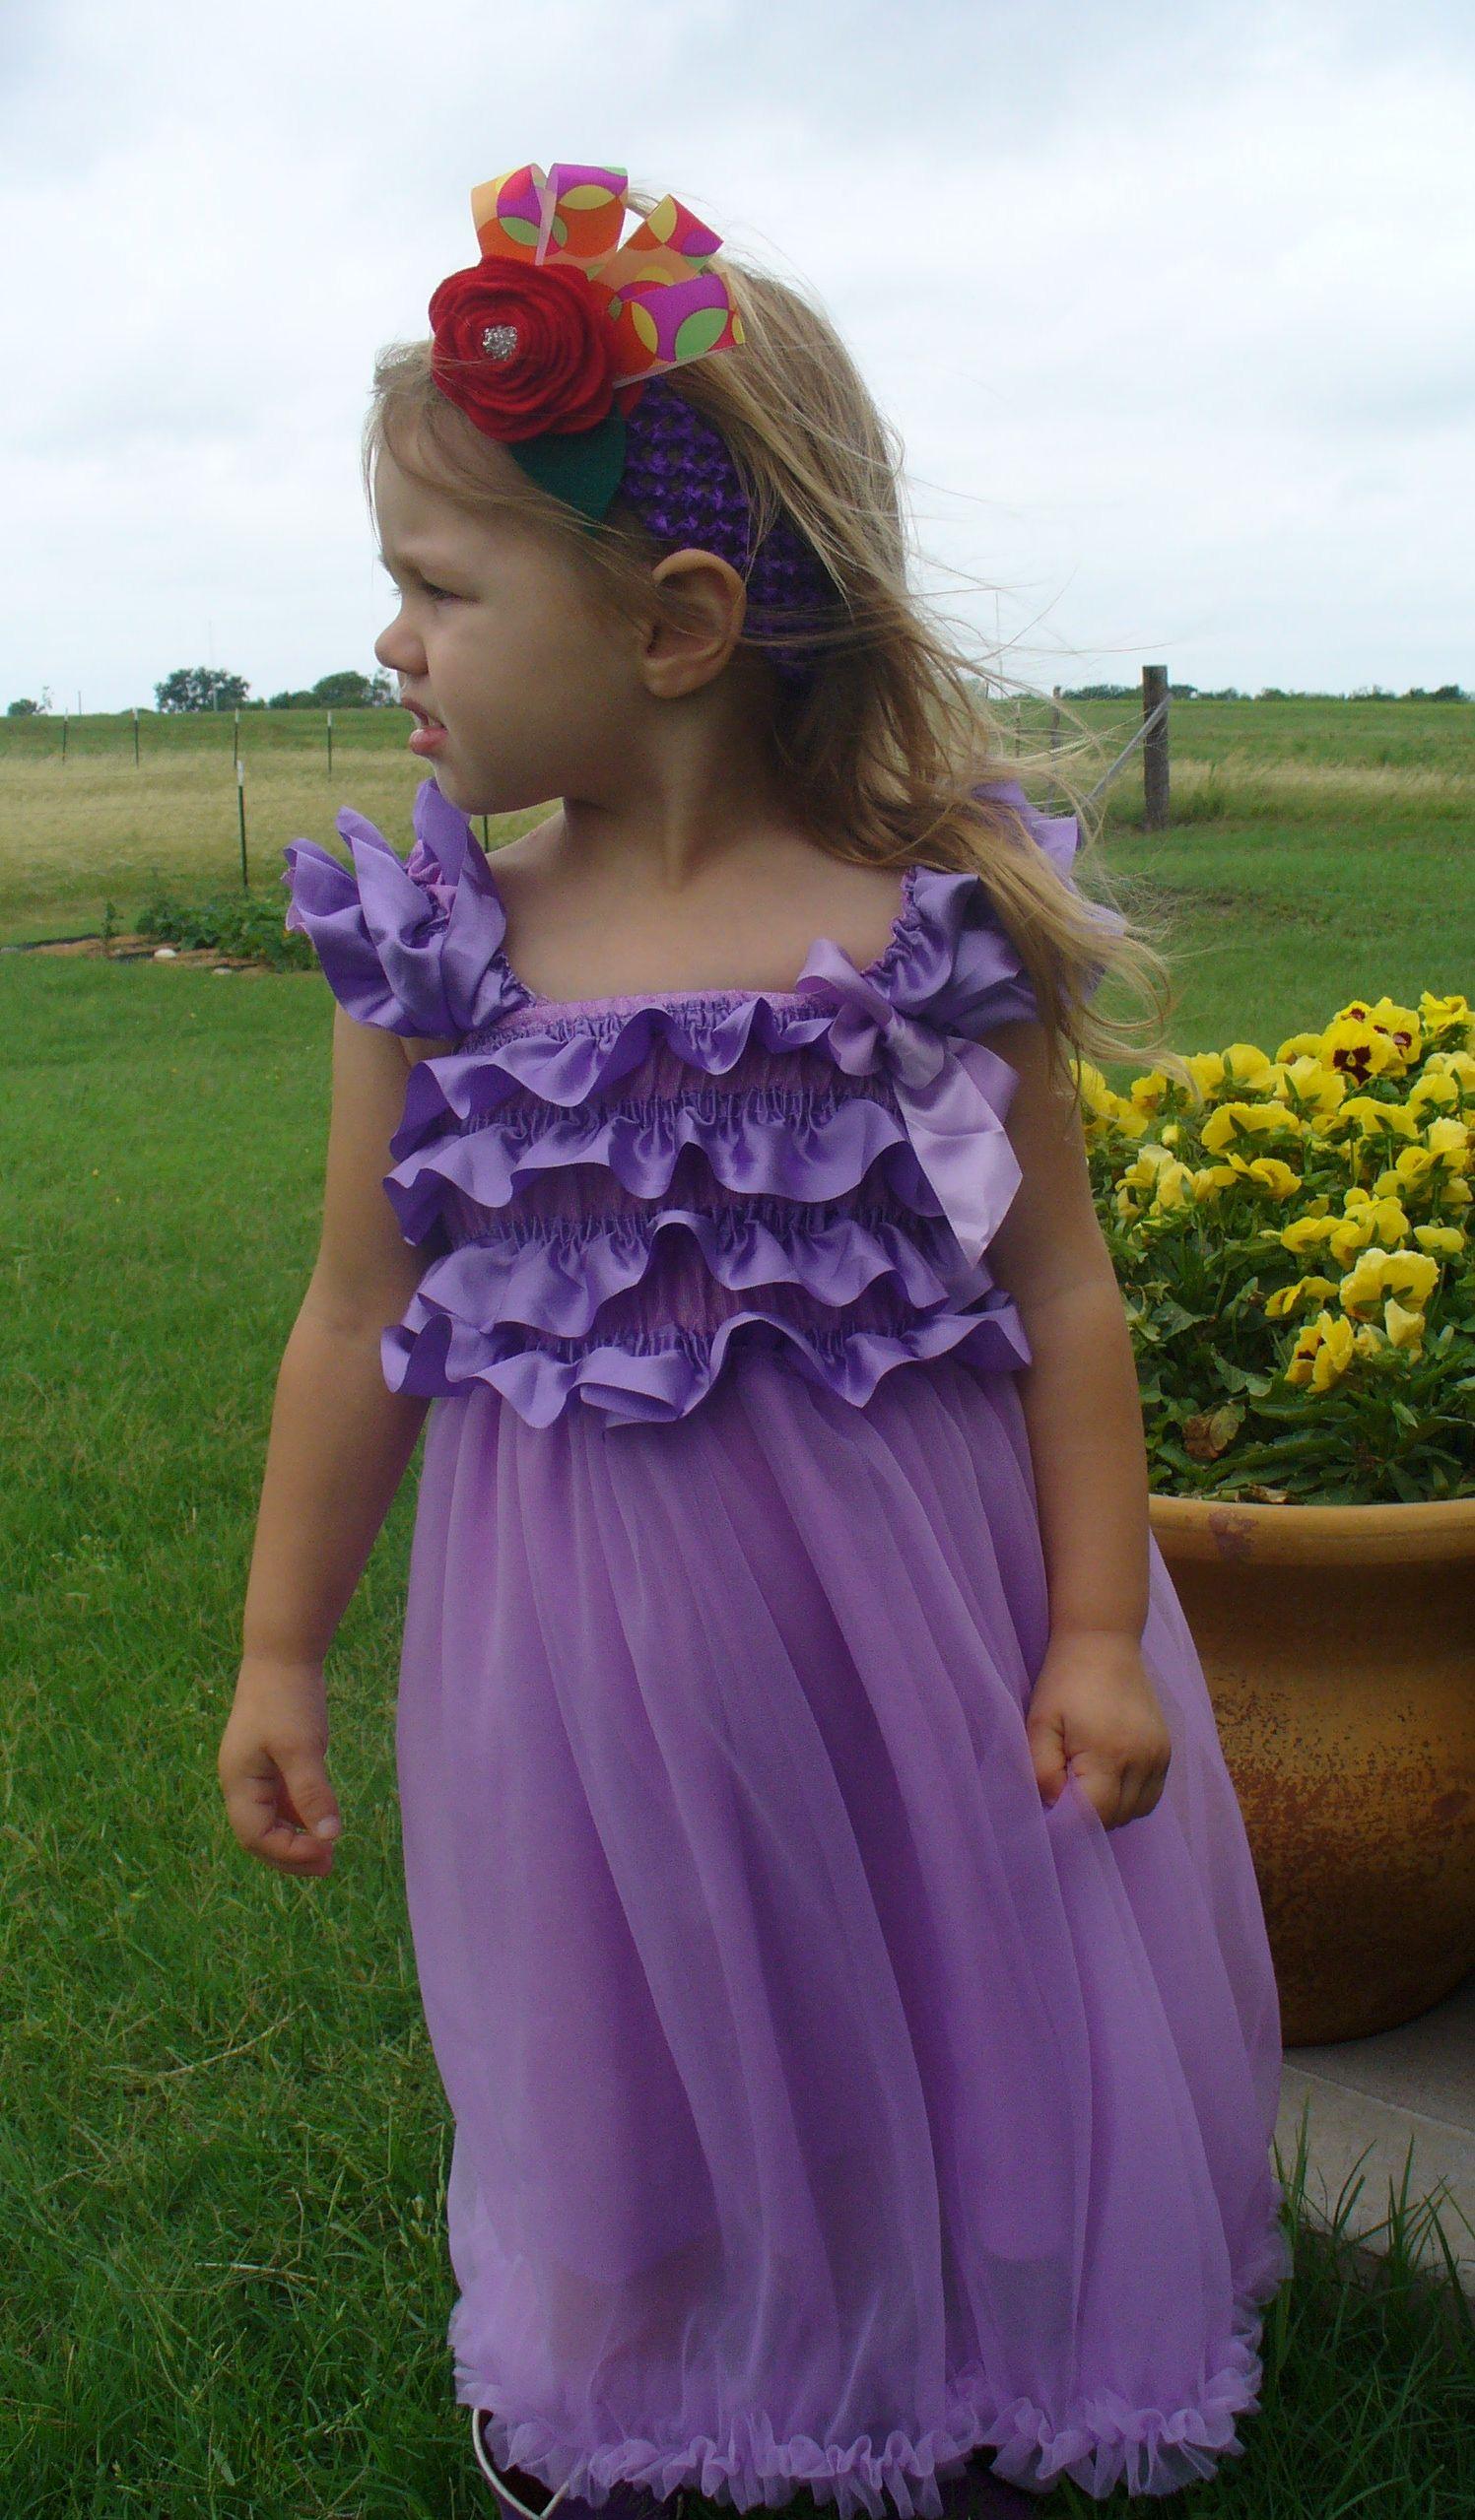 Hot Pink and Dark Purple Chiffon Dresses, Sizes 1yr, 3yr-5yr $20 plus $3 shipping